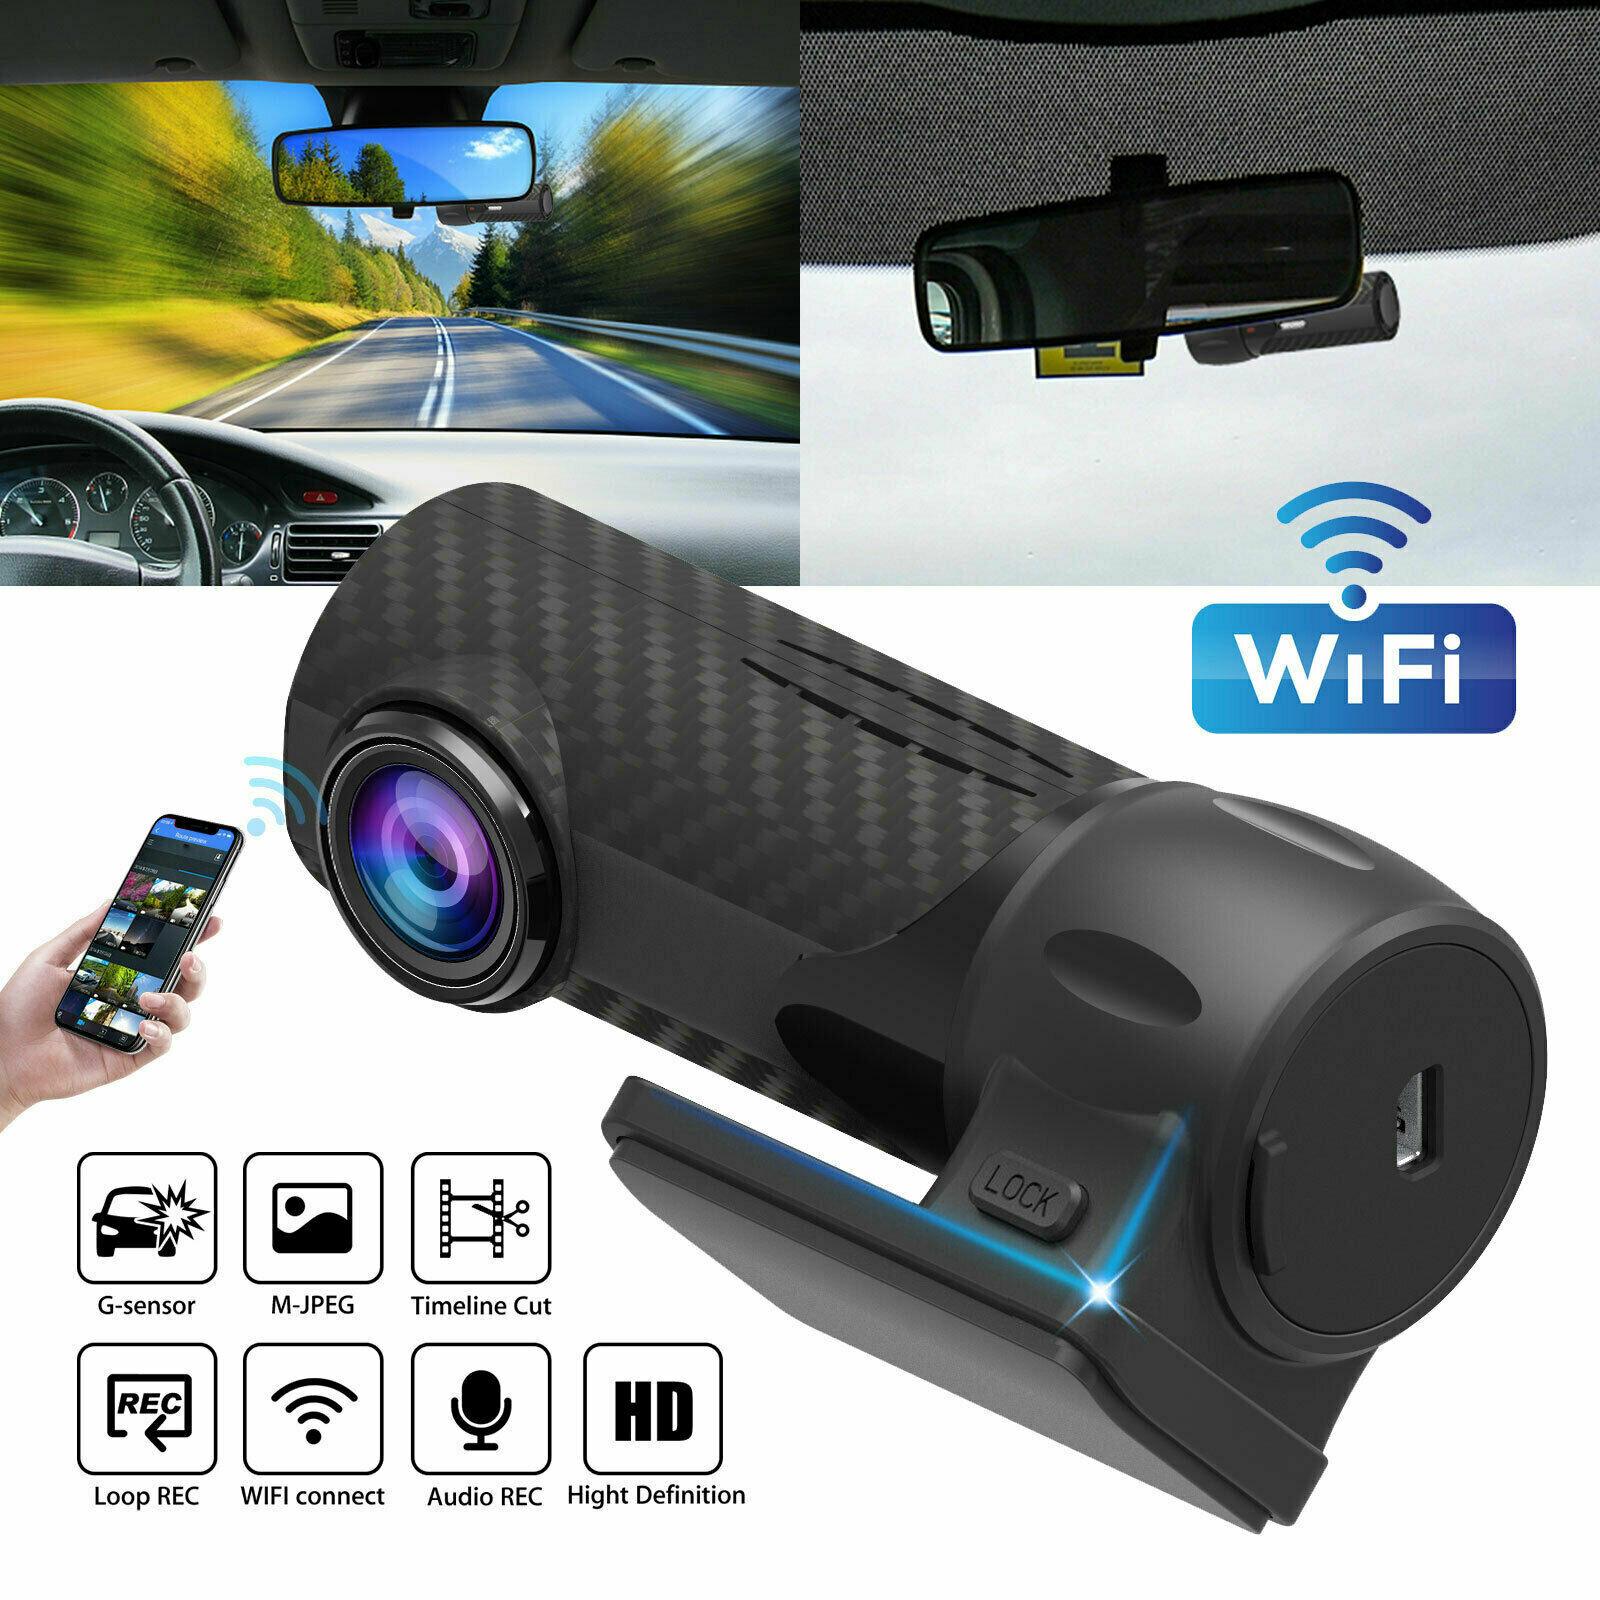 Car DVR Camera Video-Recorder Parking-Monitor Dash-Cam Hidden G-Sensor-Loop WIFI Rear-View